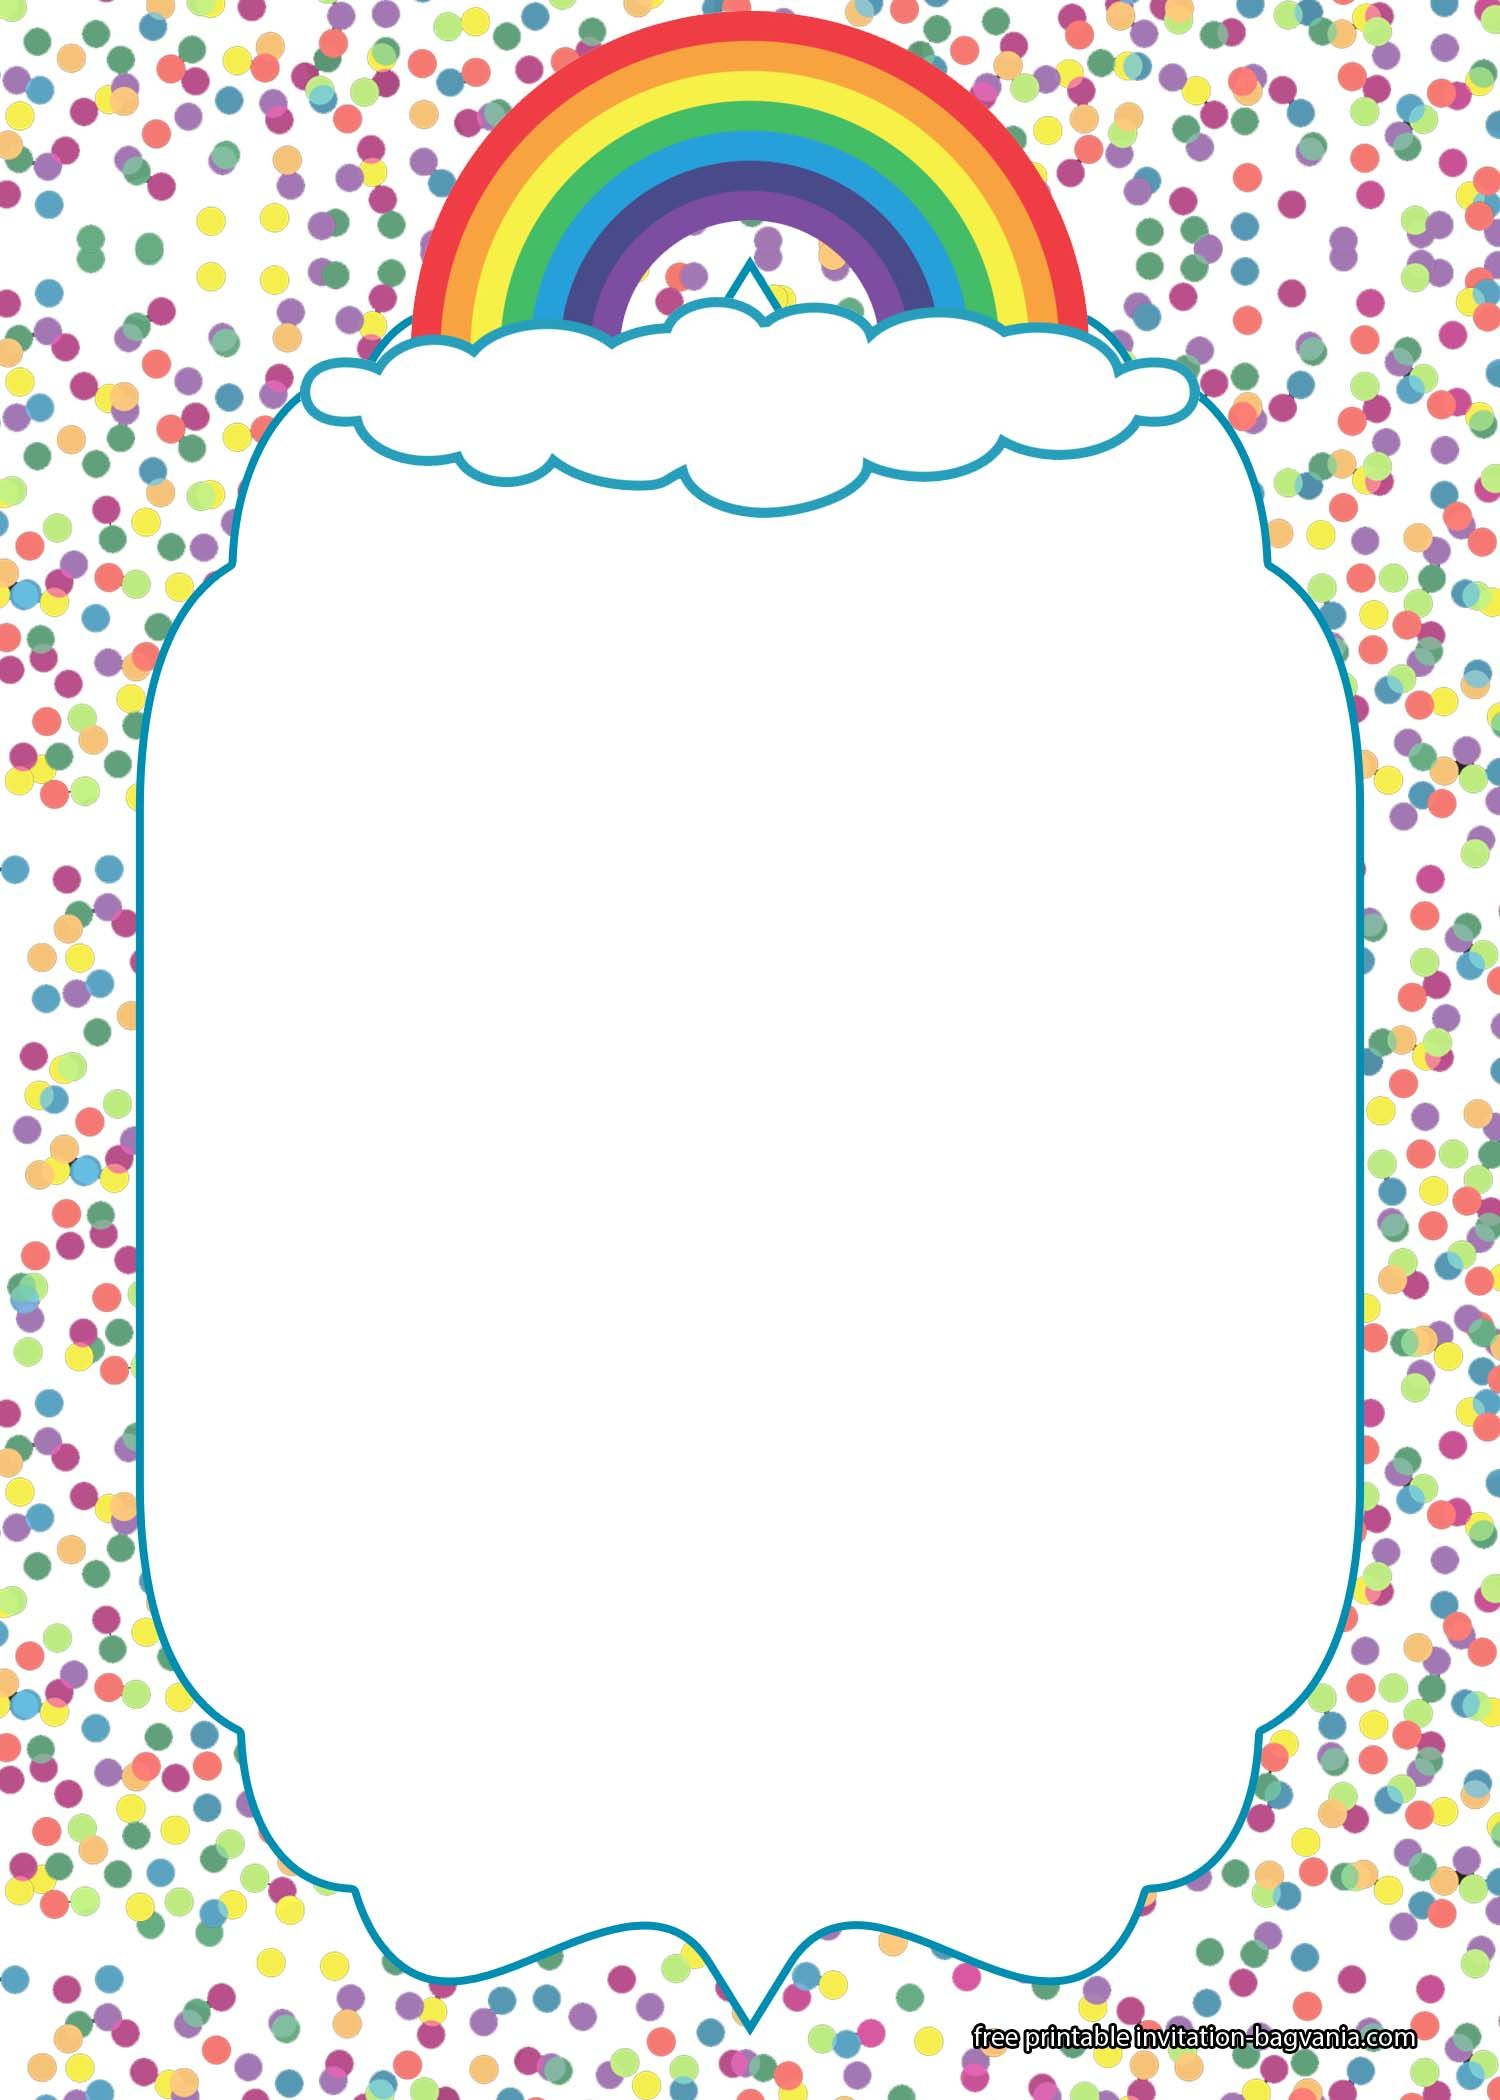 FREE Rainbow Pamper Invitation Templates | Free birthday ...